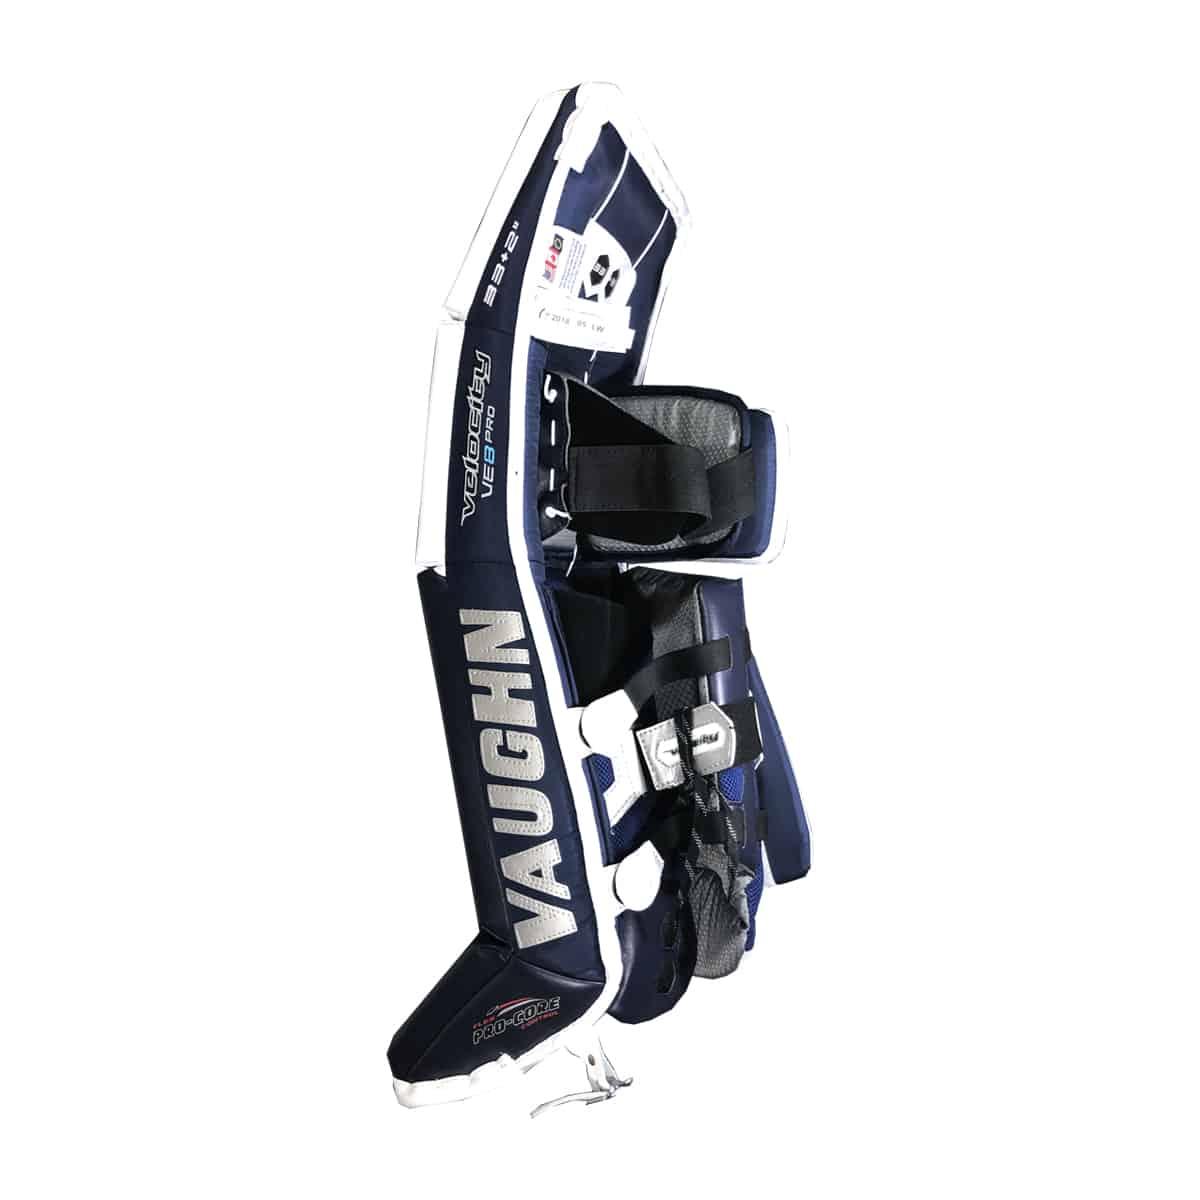 Vaughn Velocity VE8 Pro (Double Break) Senior Leg Pads - Special Edition